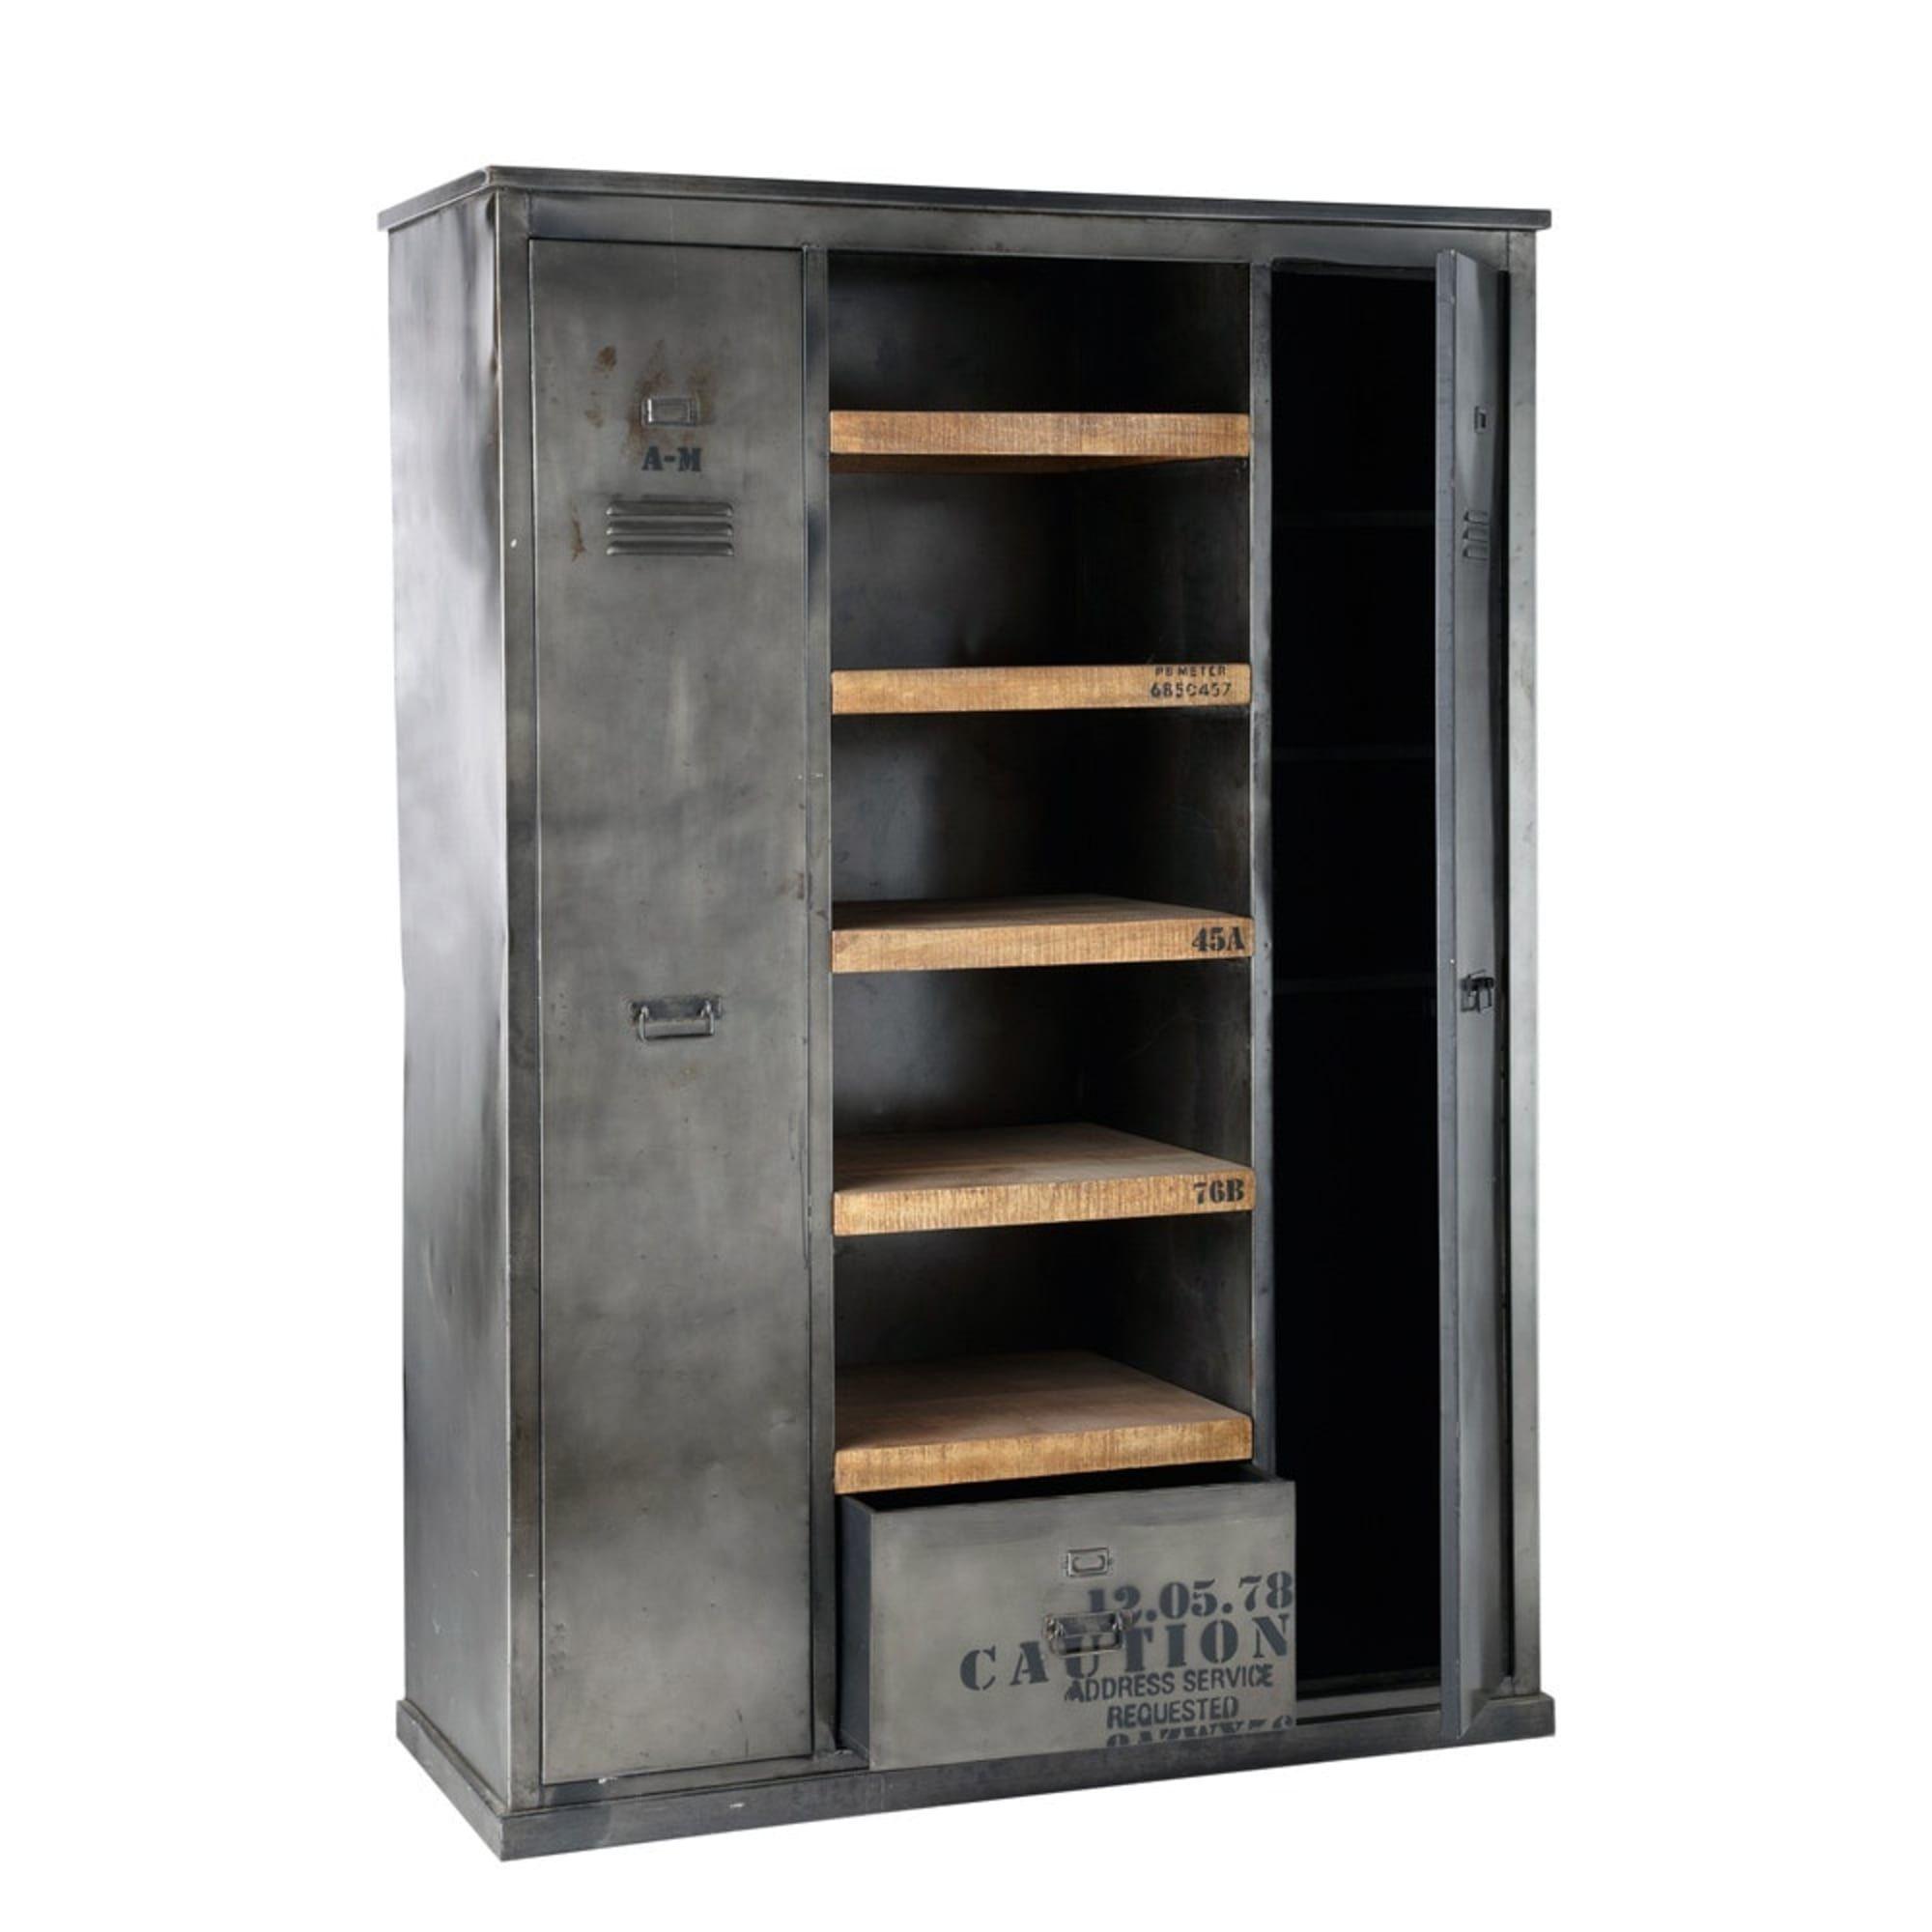 Antiqued Metal And Solid Mango Wood Industrial Closet Maisons Du Monde In 2020 Industriedesign Mobel Kleiderschrank Holz Industrieller Schrank